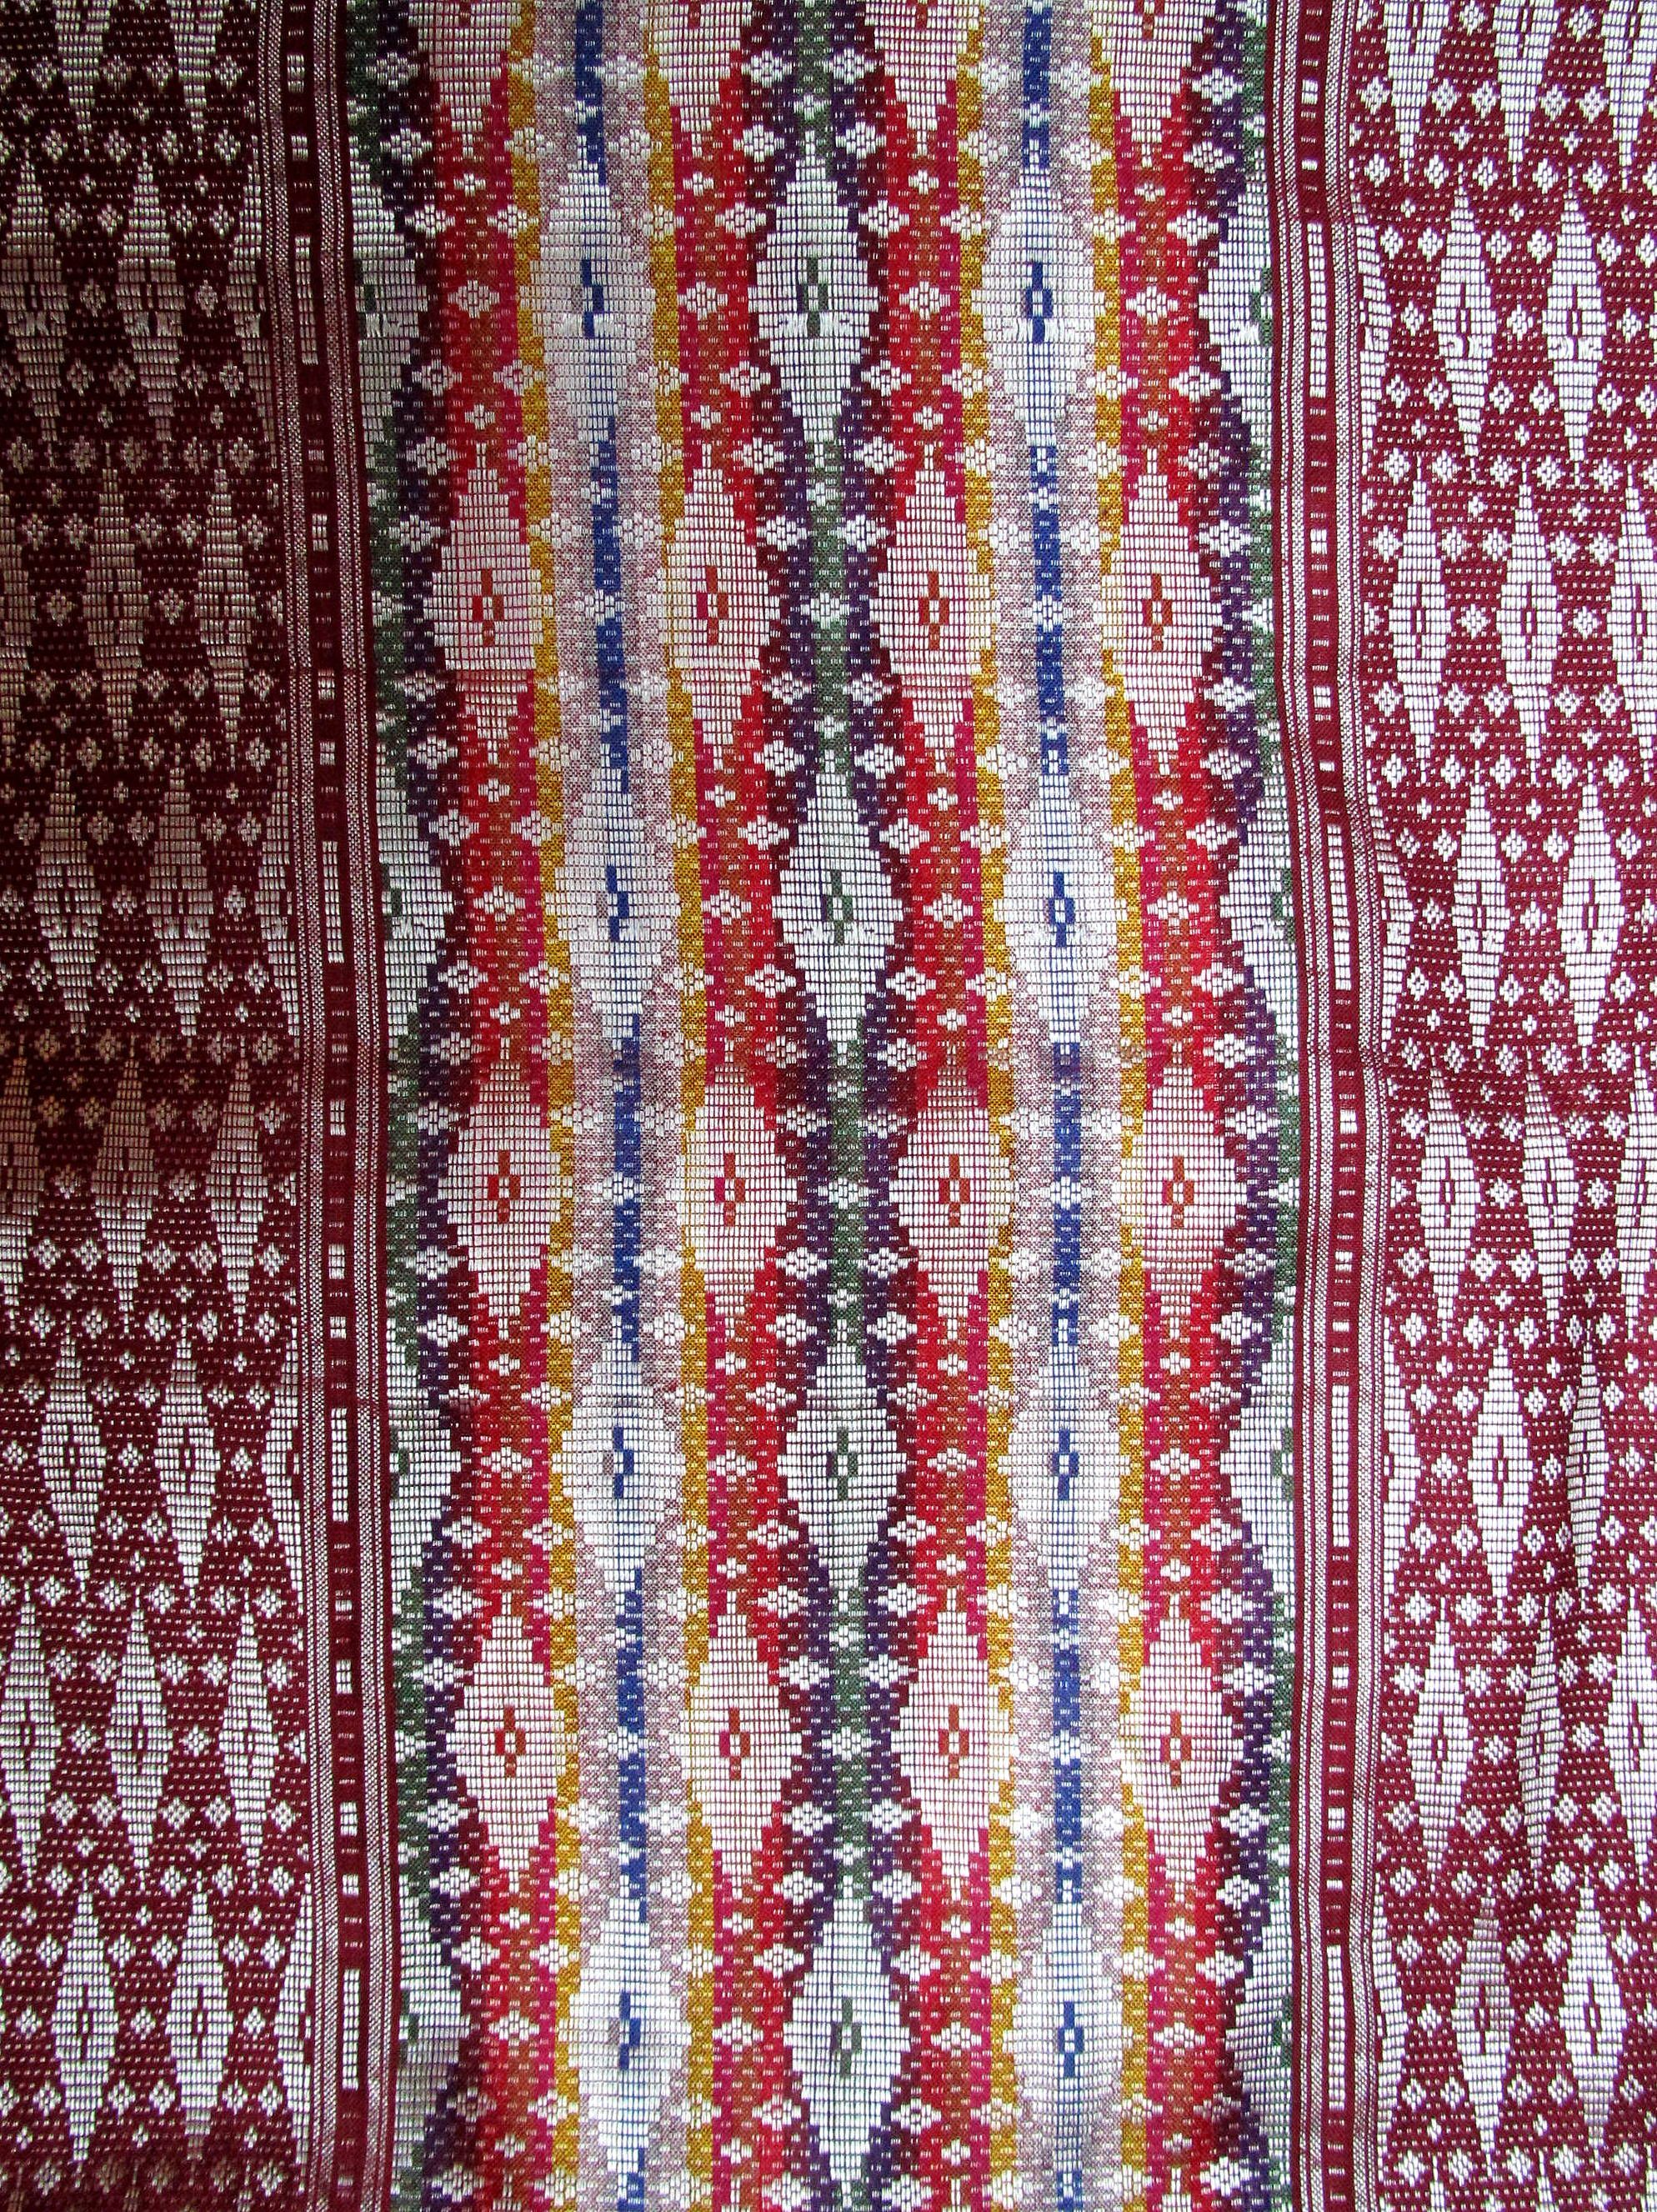 kain songket Bali Indonesian fabric  textiles  Pinterest